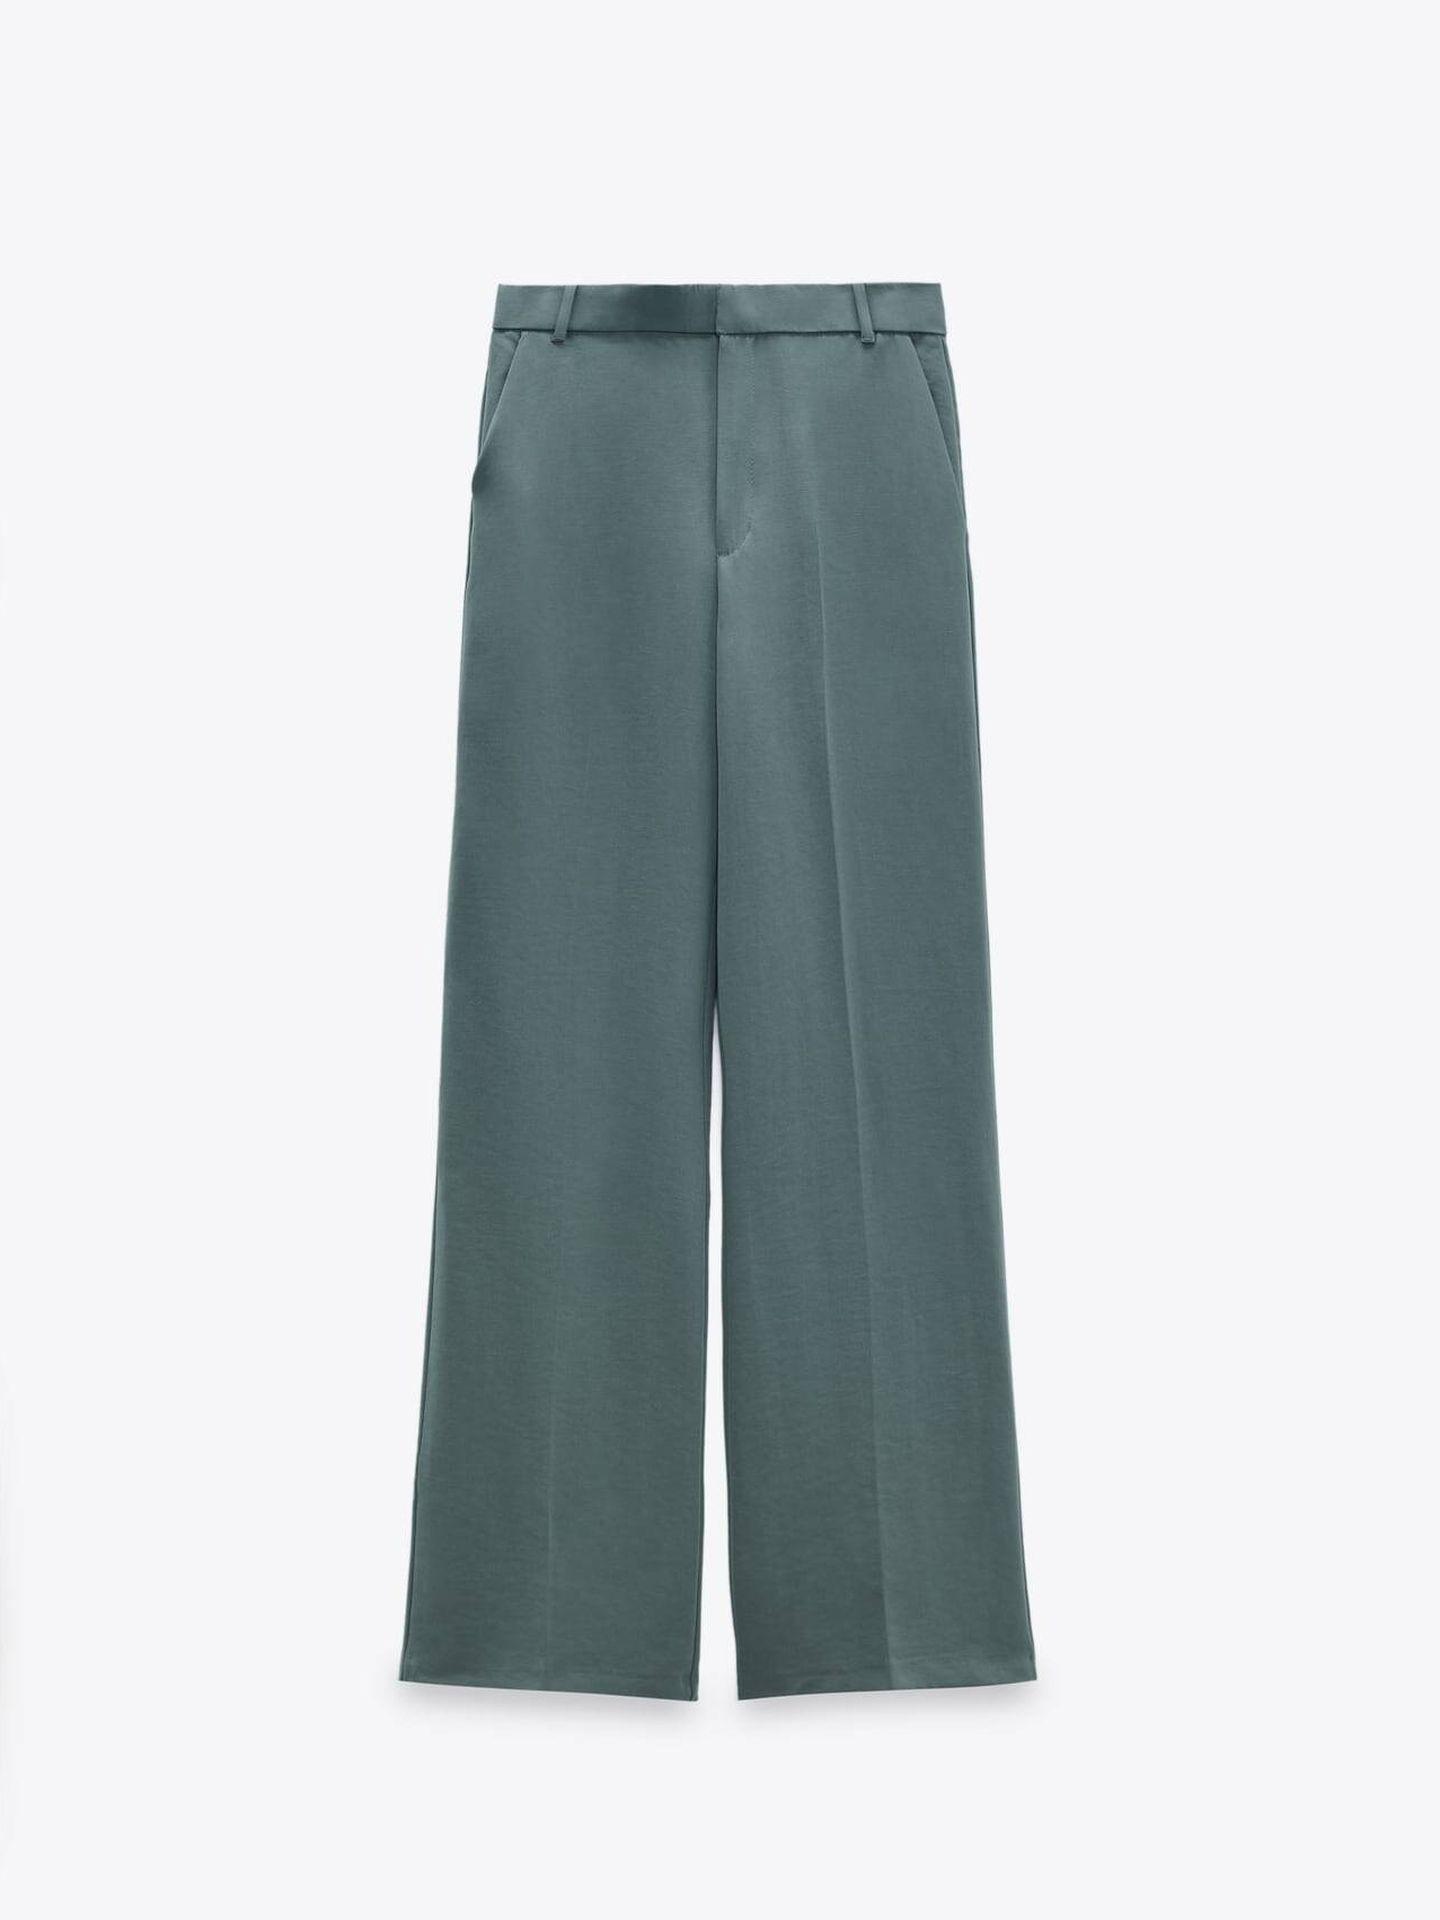 Pantalón de vestir de Zara. (Cortesía)